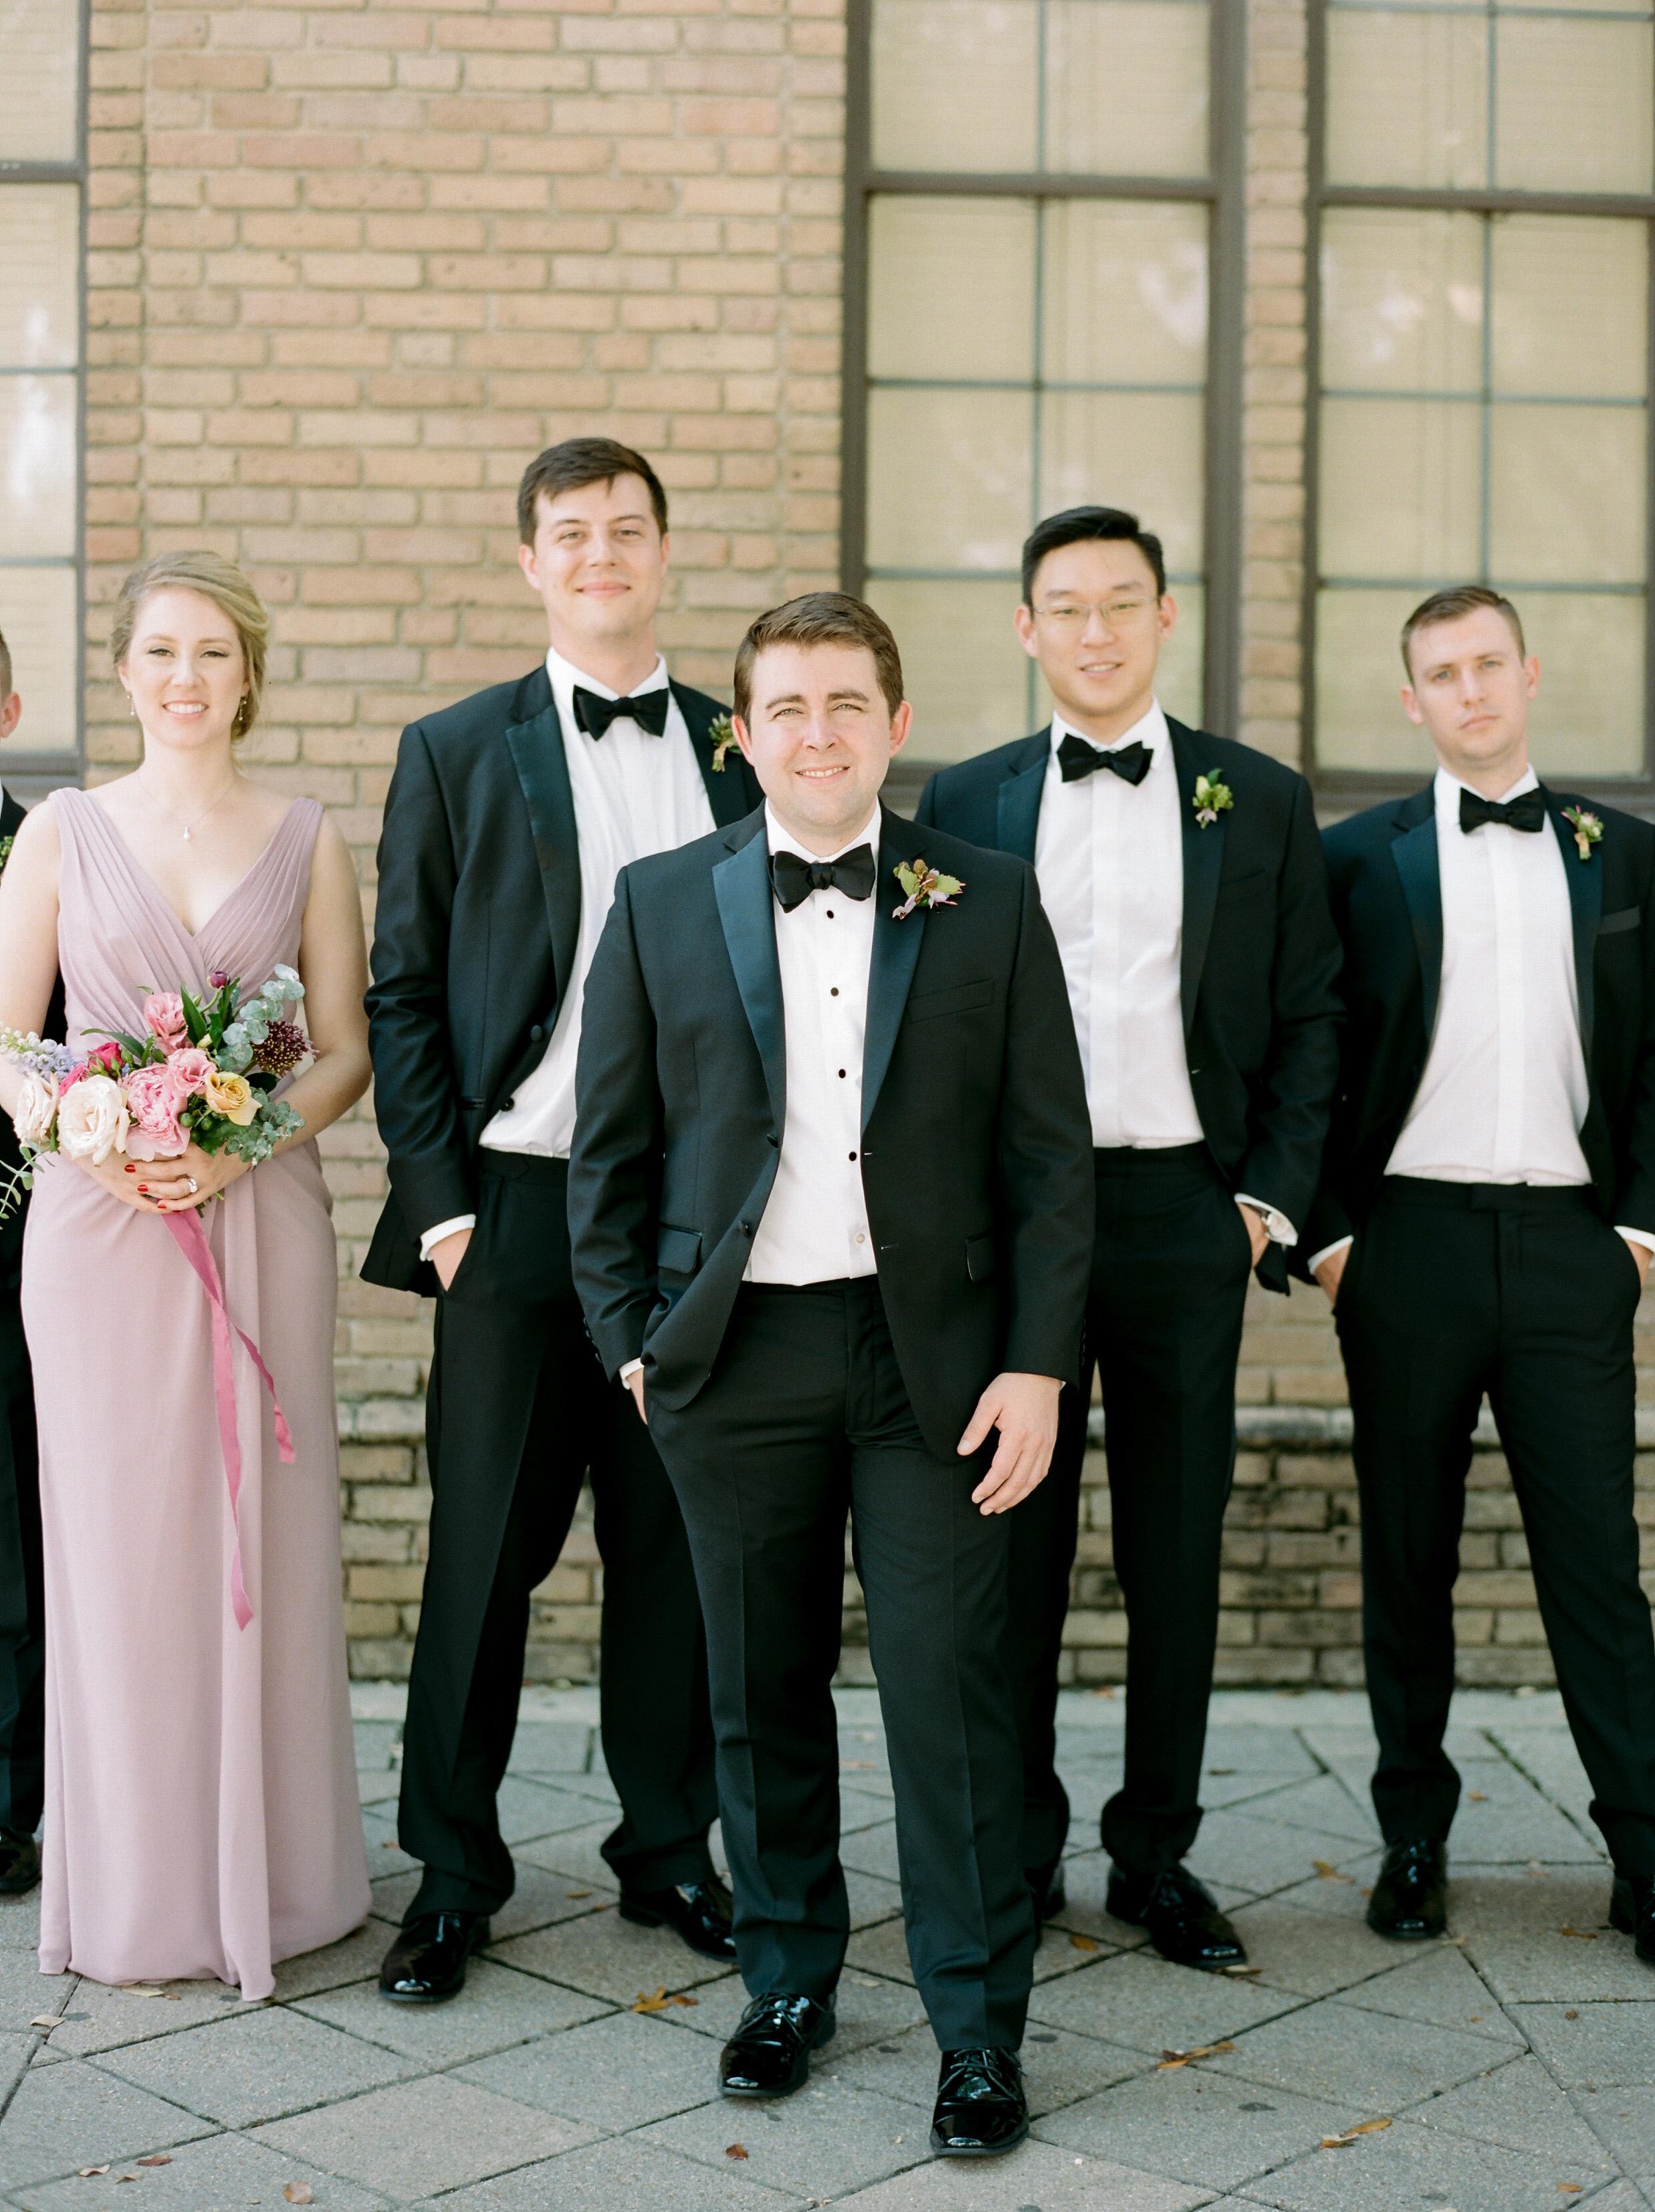 The-Knot-Texas-Fine-Art-Wedding-Film-Destination-Photographer-Houston-Austin-Dallas-New-Orleans-Julia-Ideson-Library-Event-Dana-Josh-Fernandez-Photograph-Top-Best-37.jpg